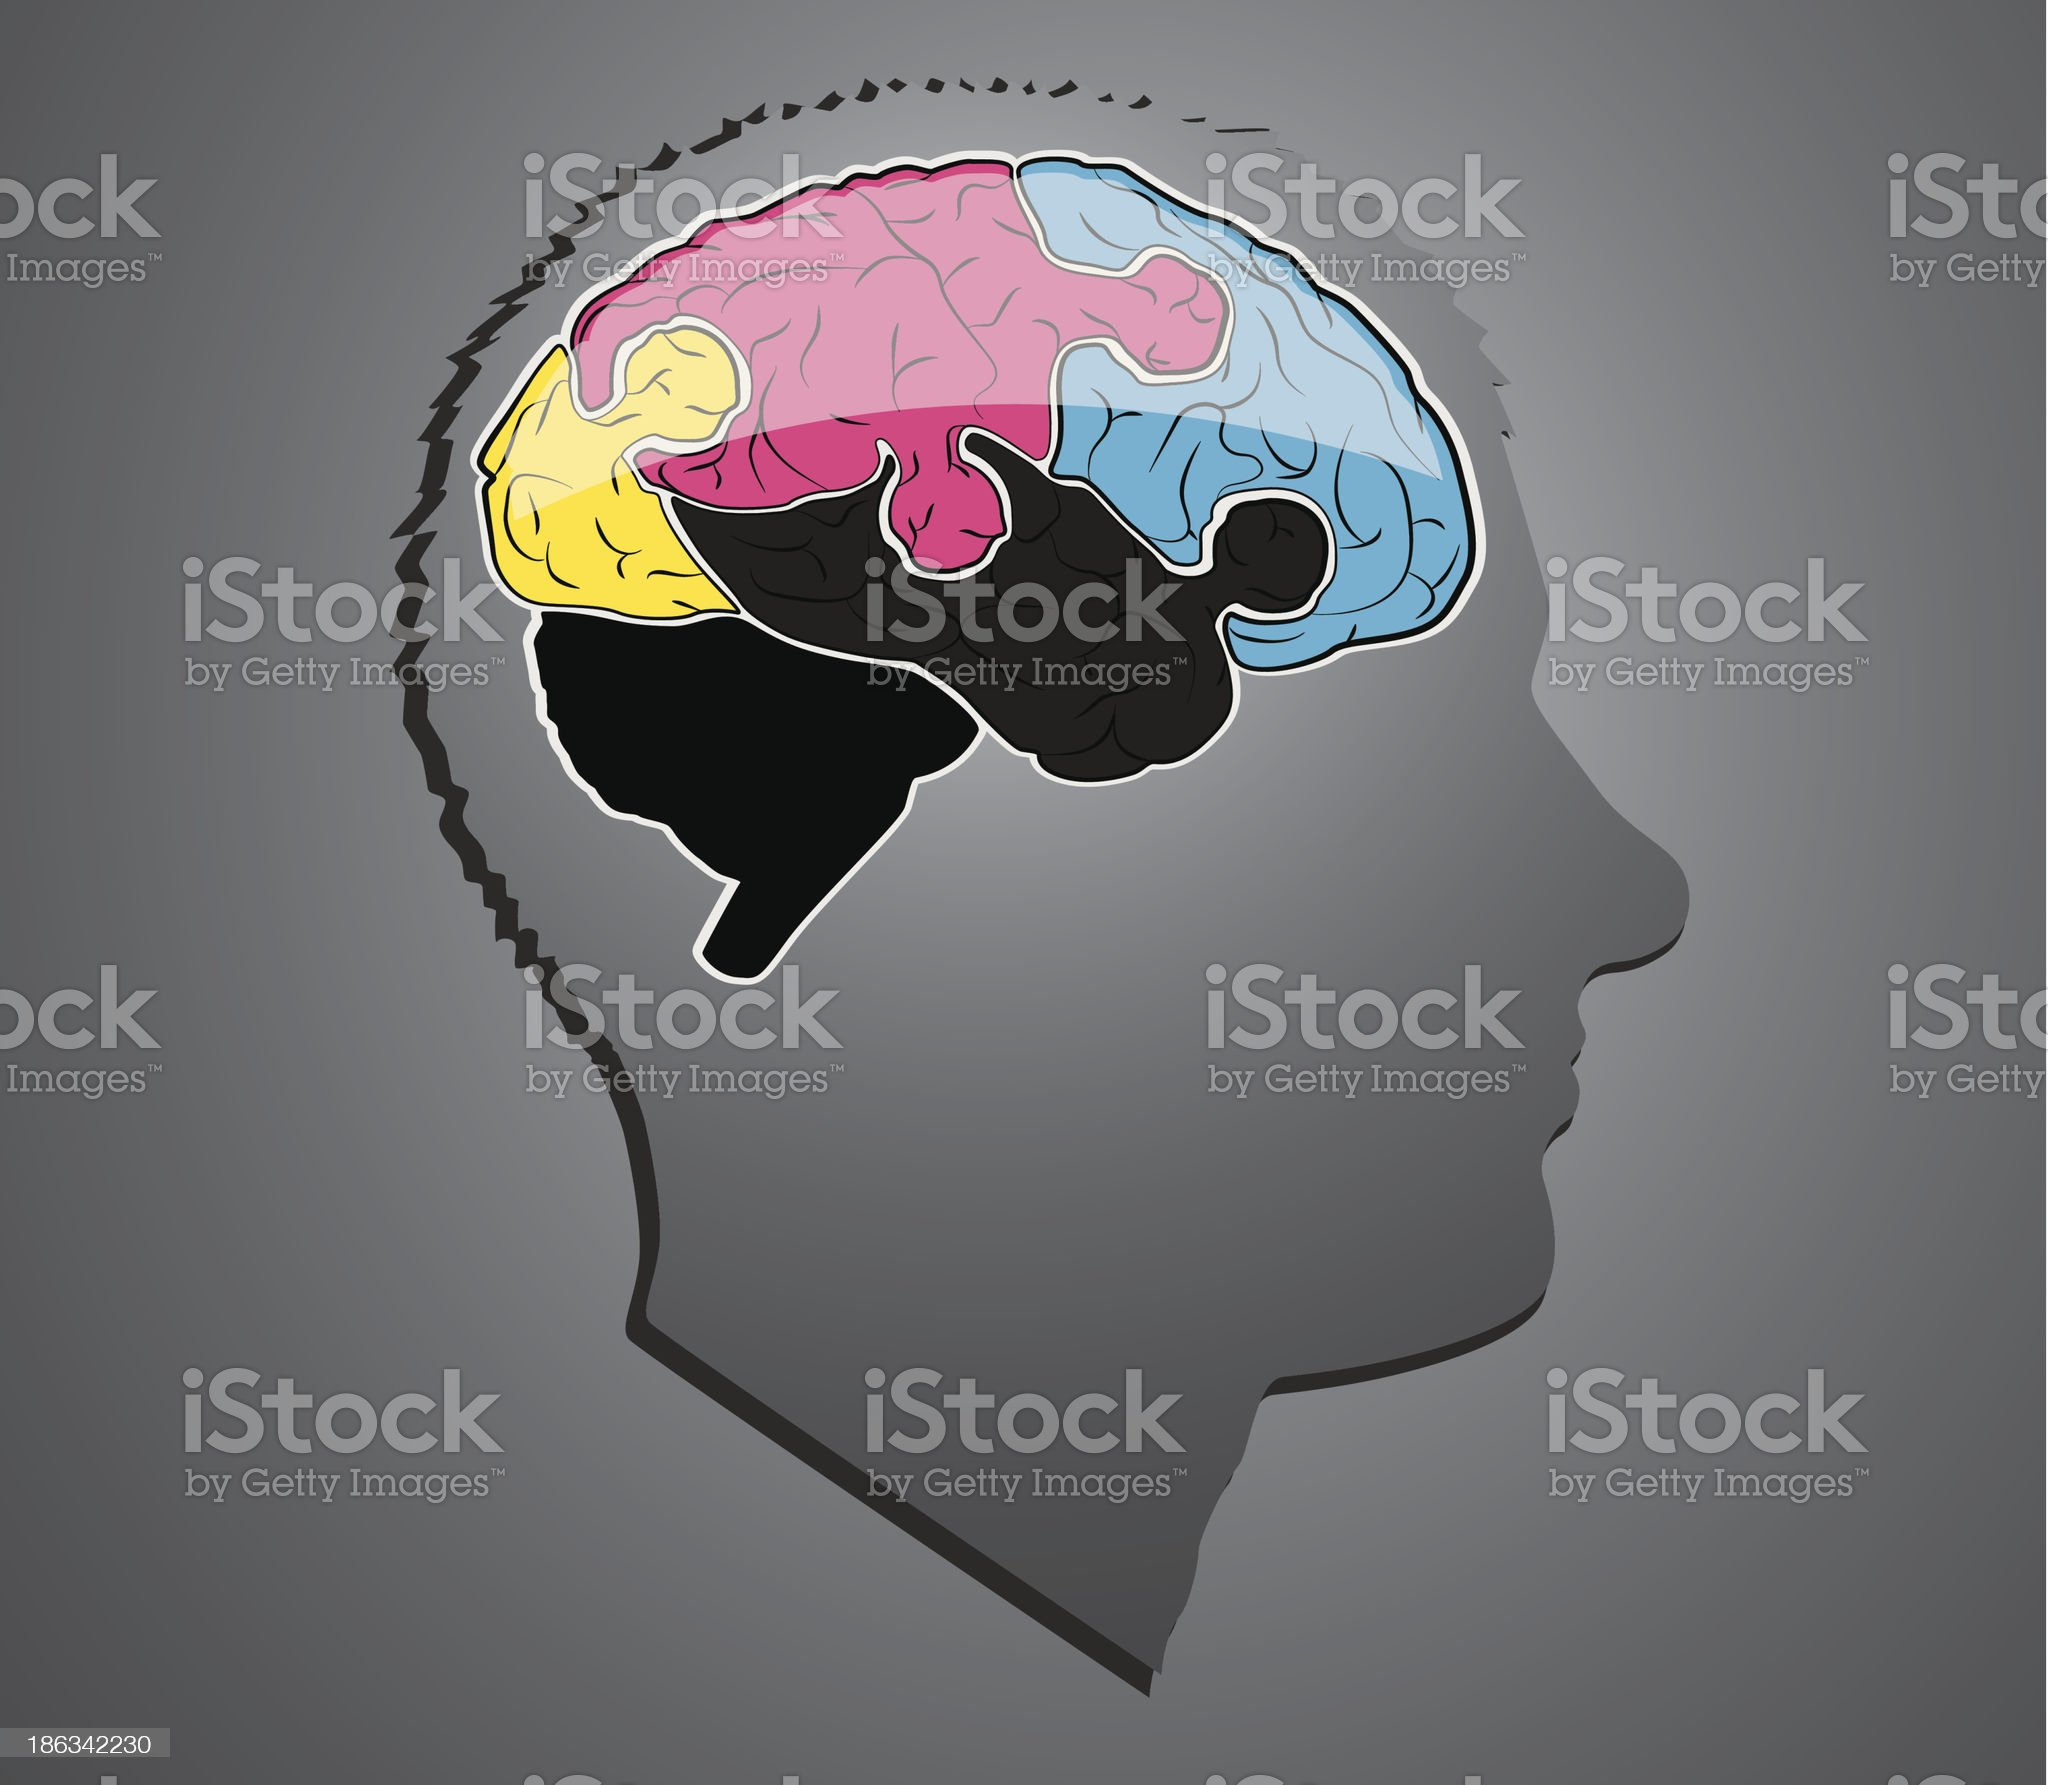 brain puzzle royalty-free stock vector art